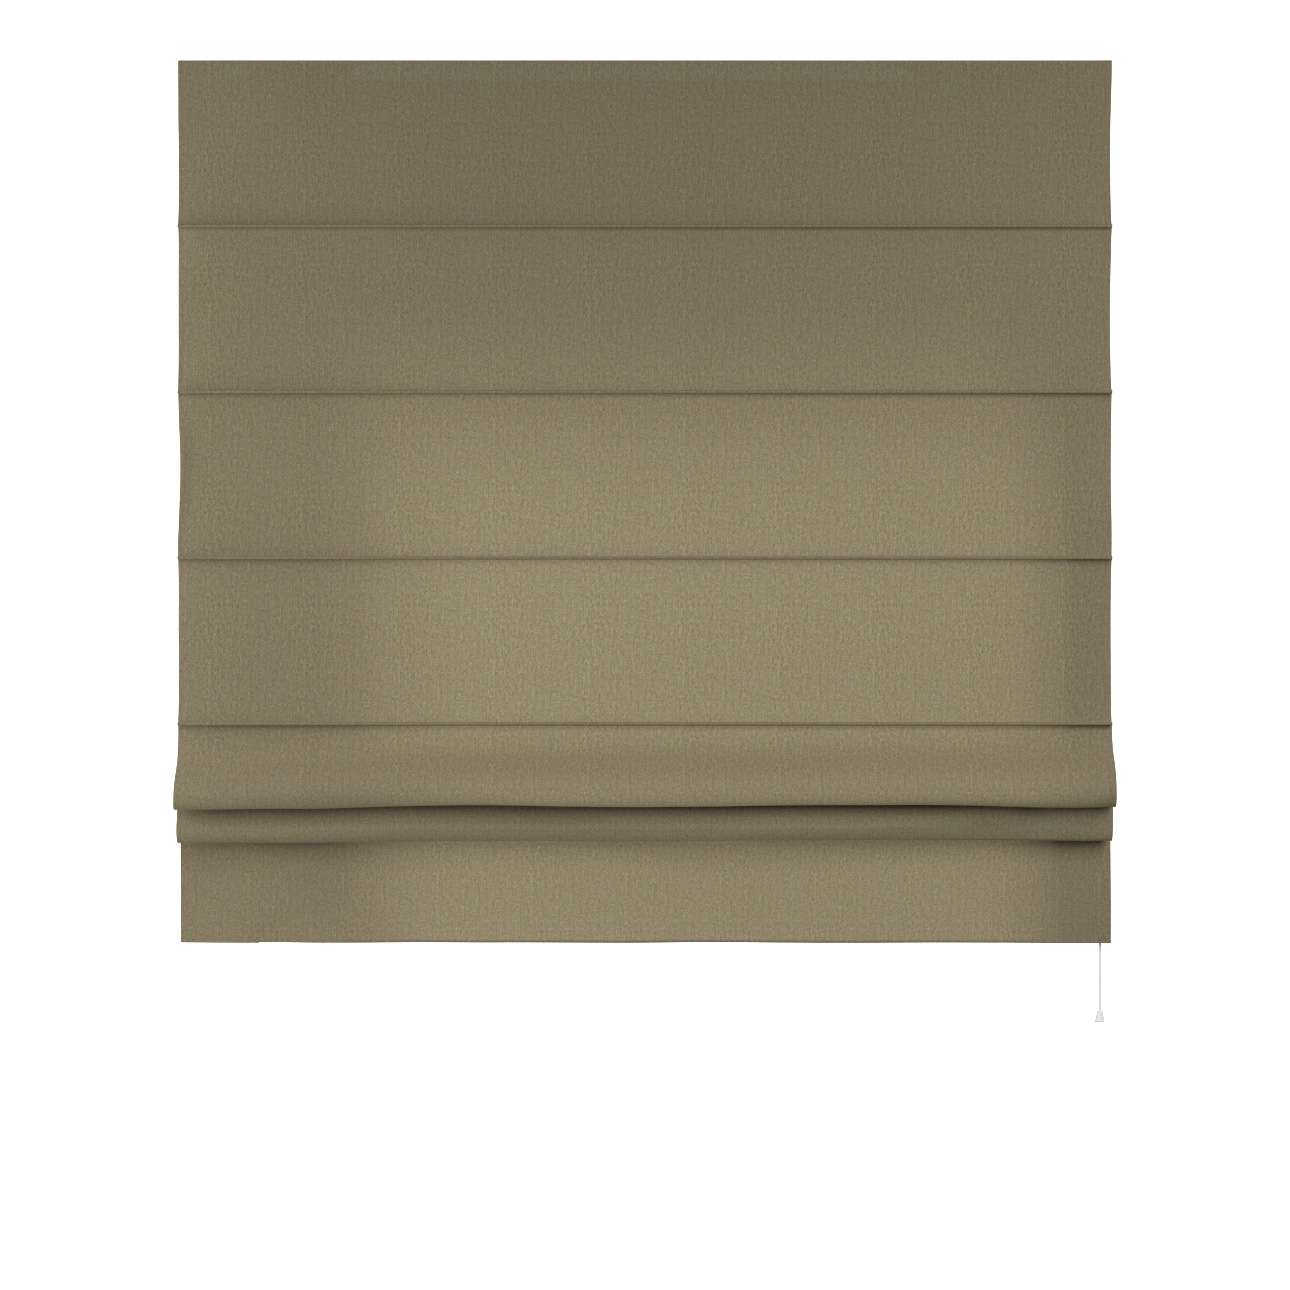 Romanetės Padva 80 x 170 cm (plotis x ilgis) kolekcijoje Chenille, audinys: 702-21